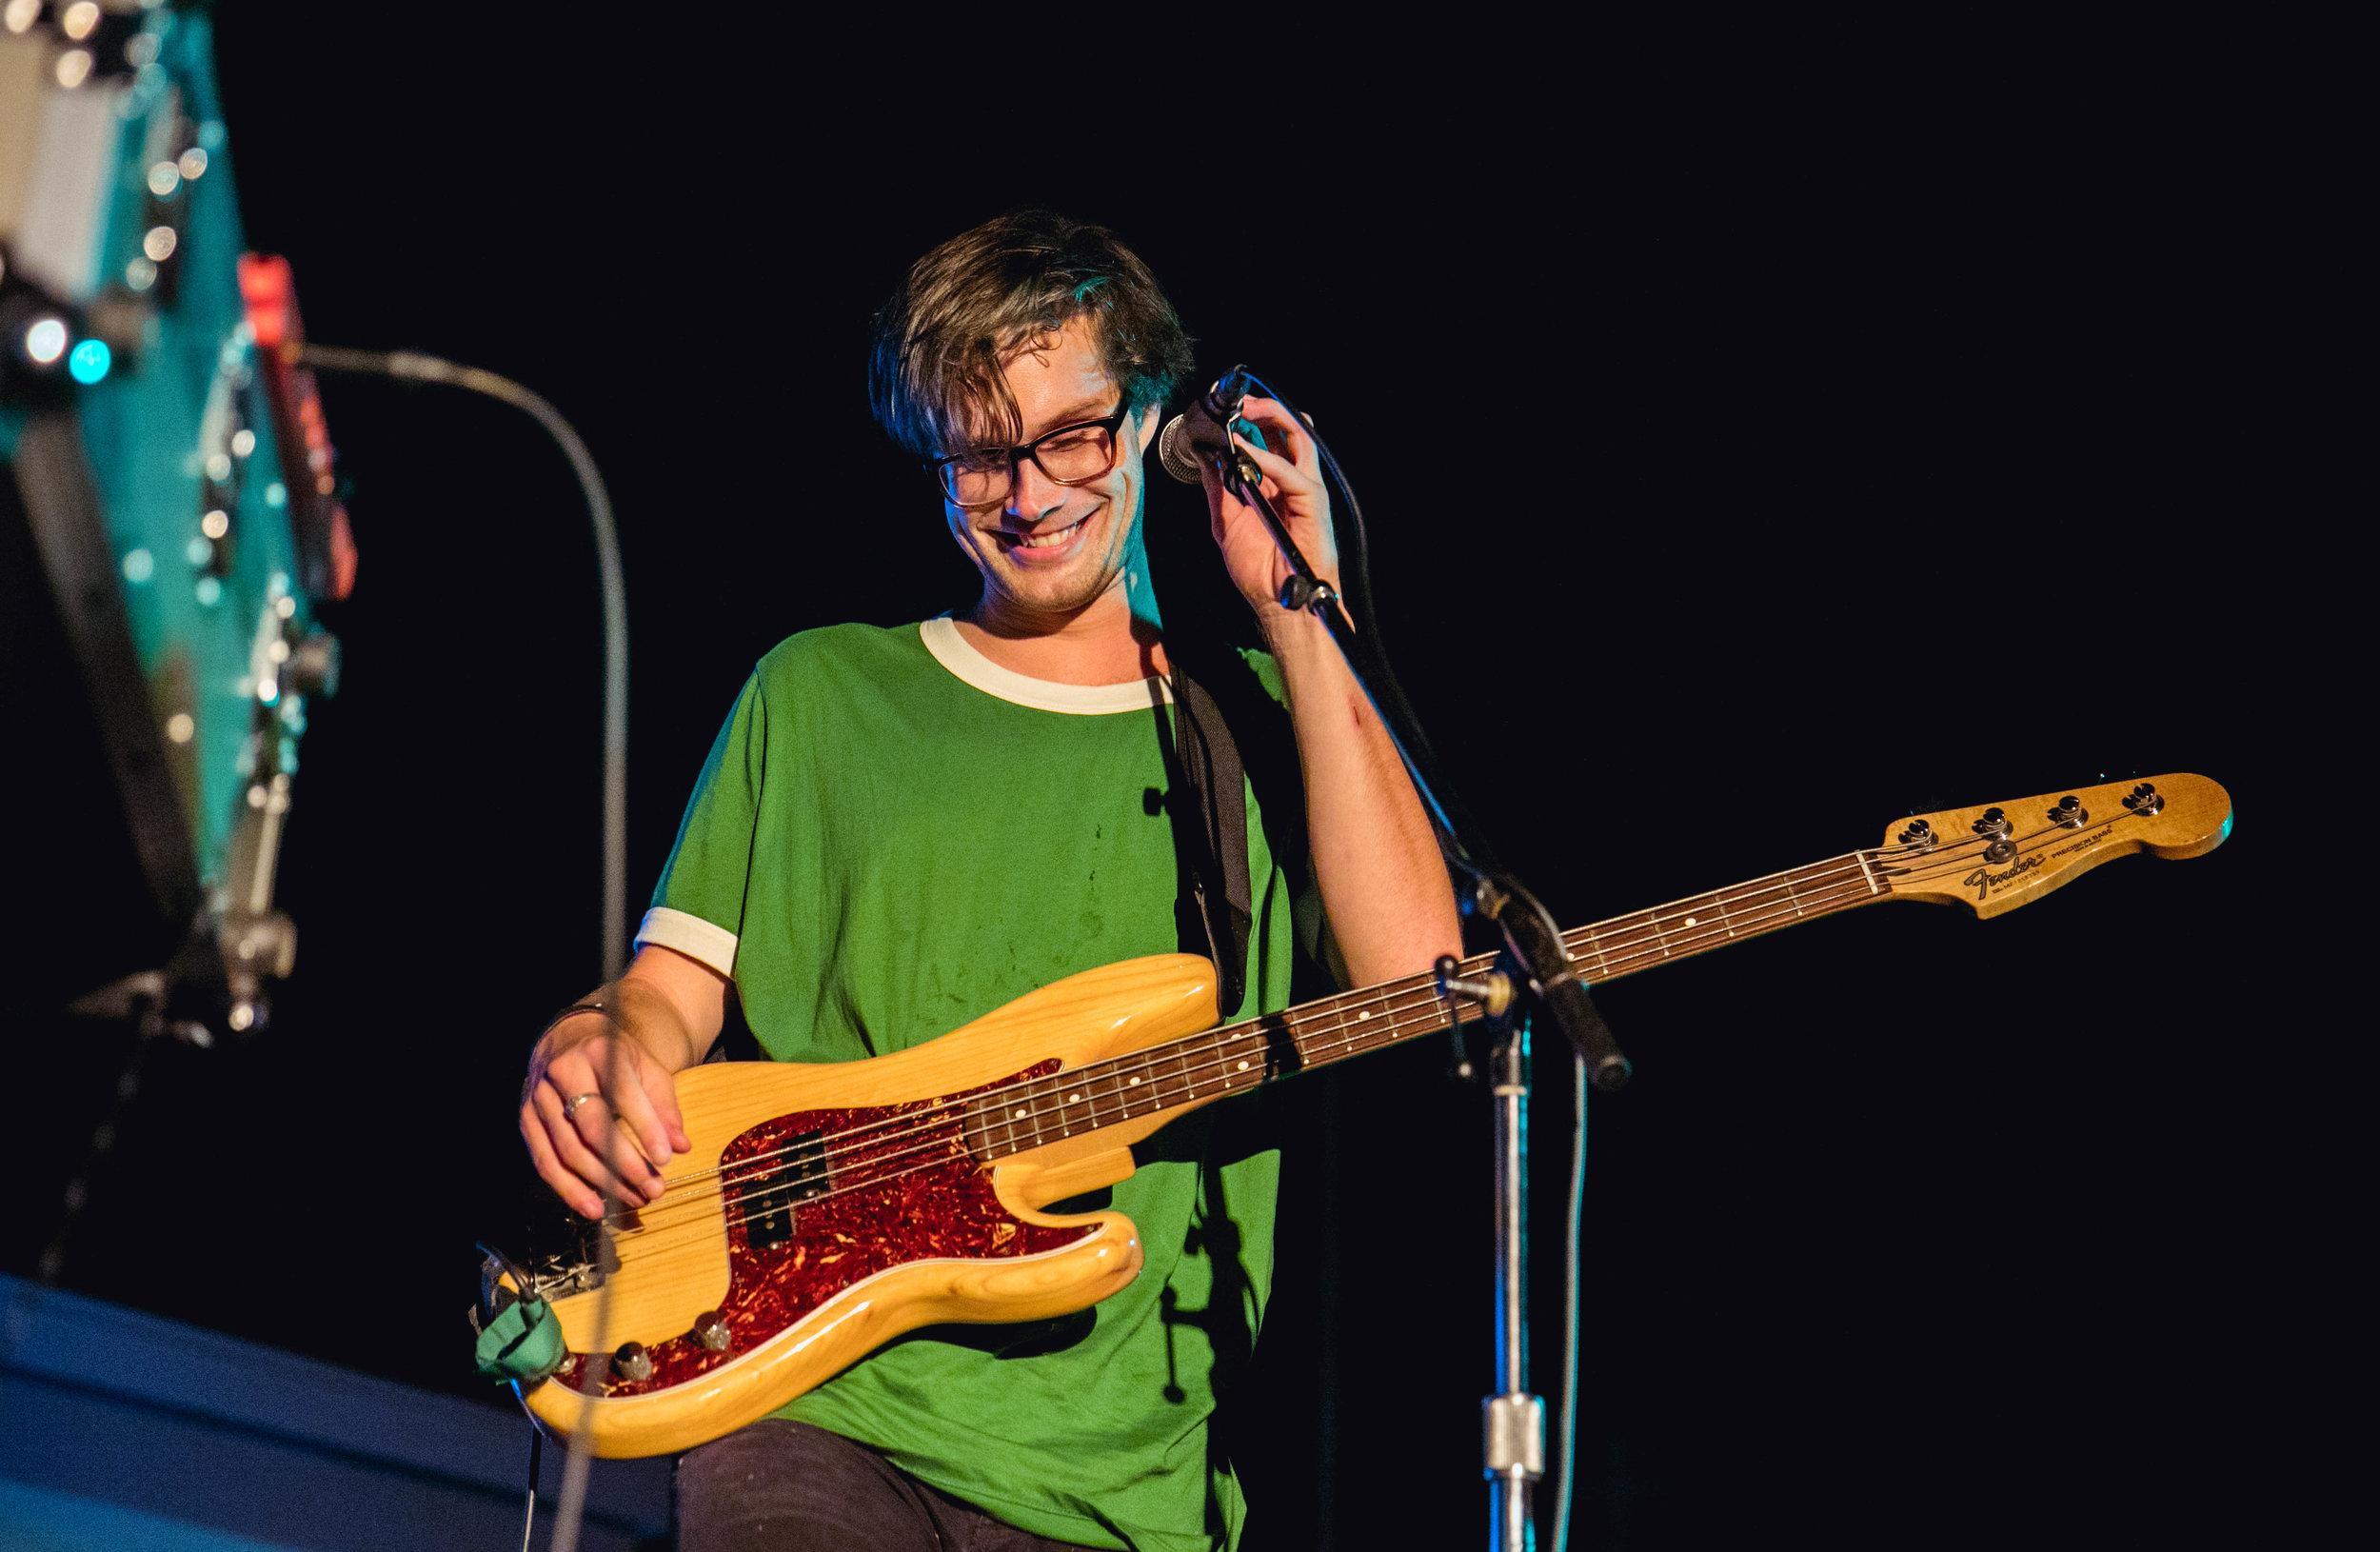 carlsbadmusicfest-56.jpg